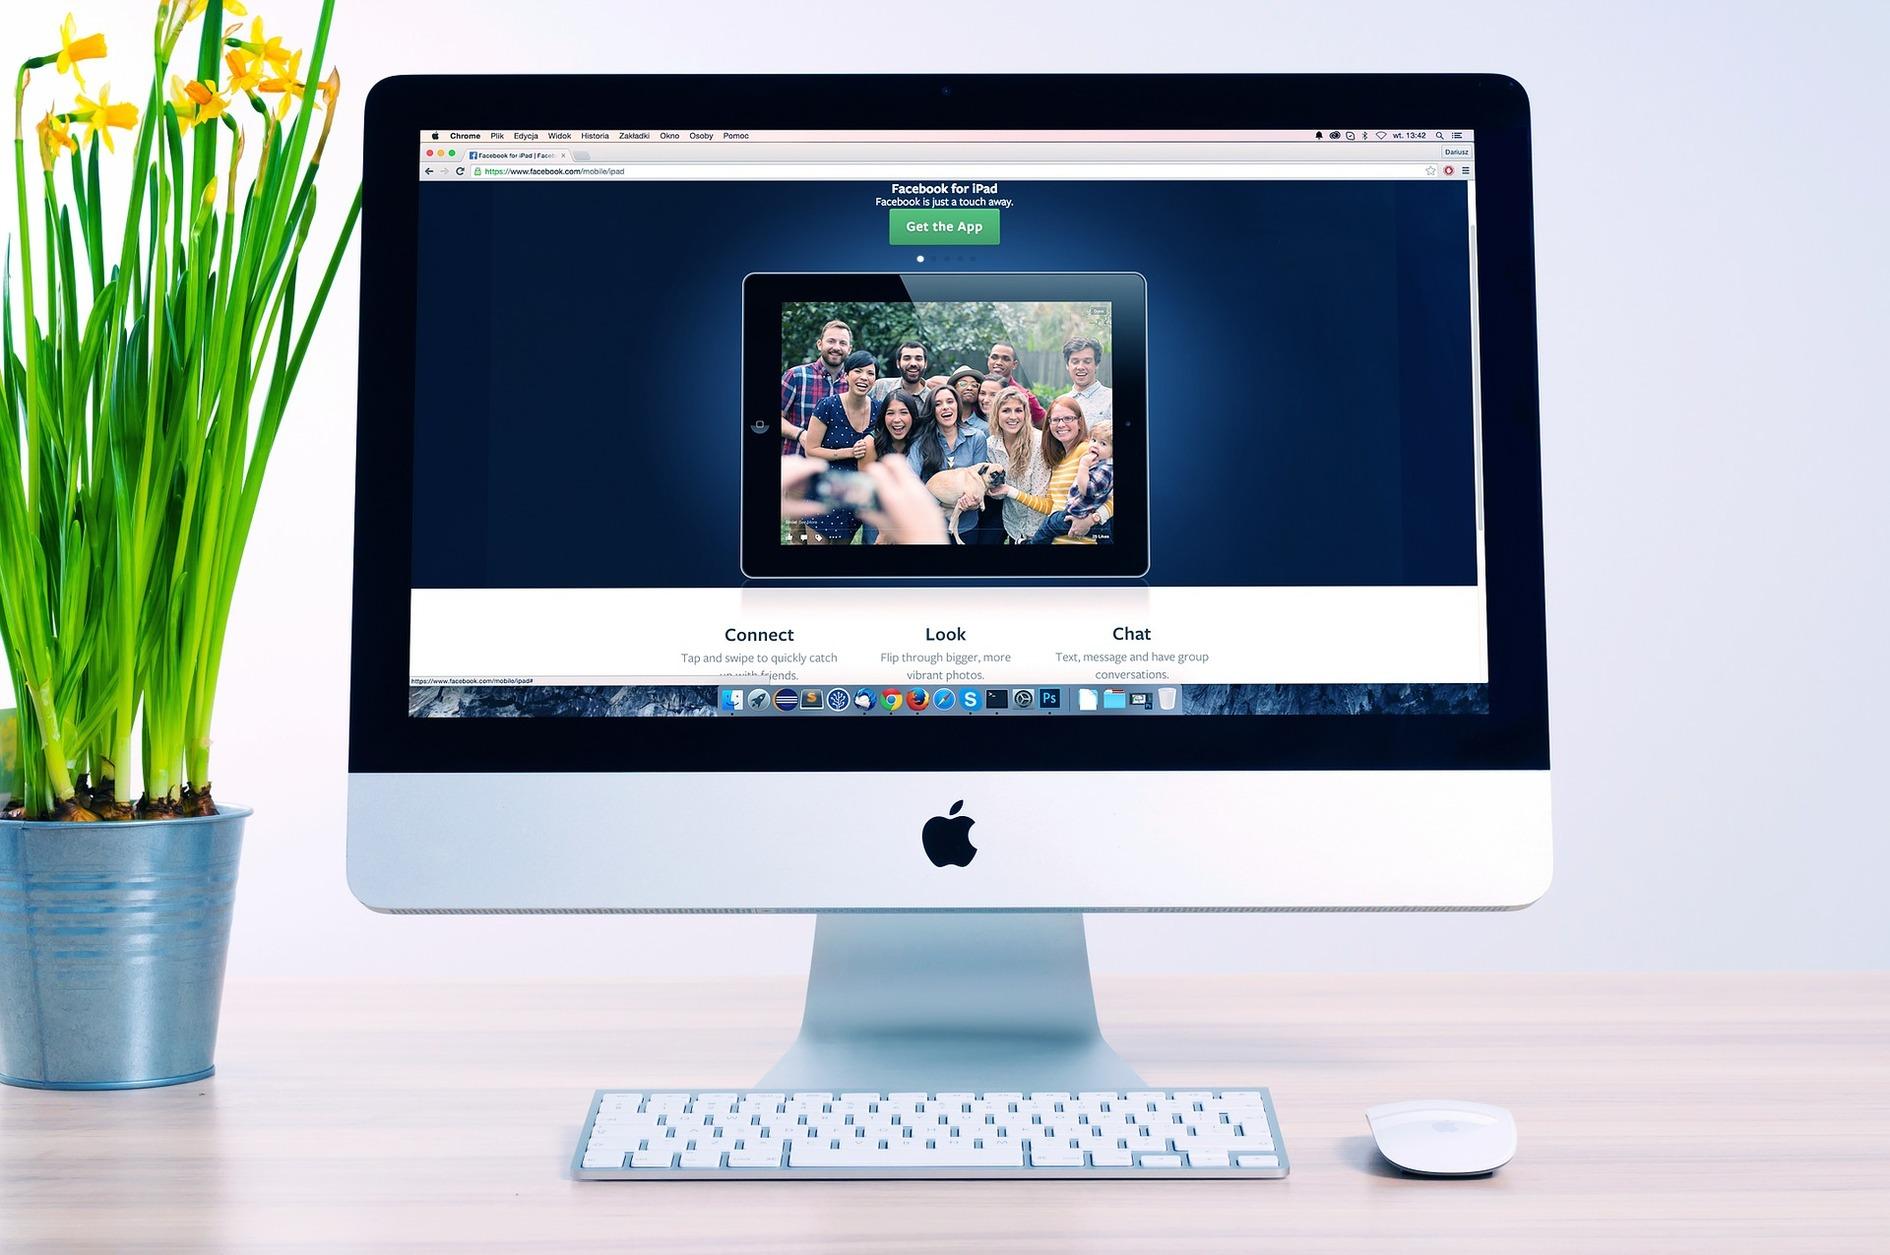 Webサイト作成時の参考に!WordPressで作られた魅力的なサイト50選